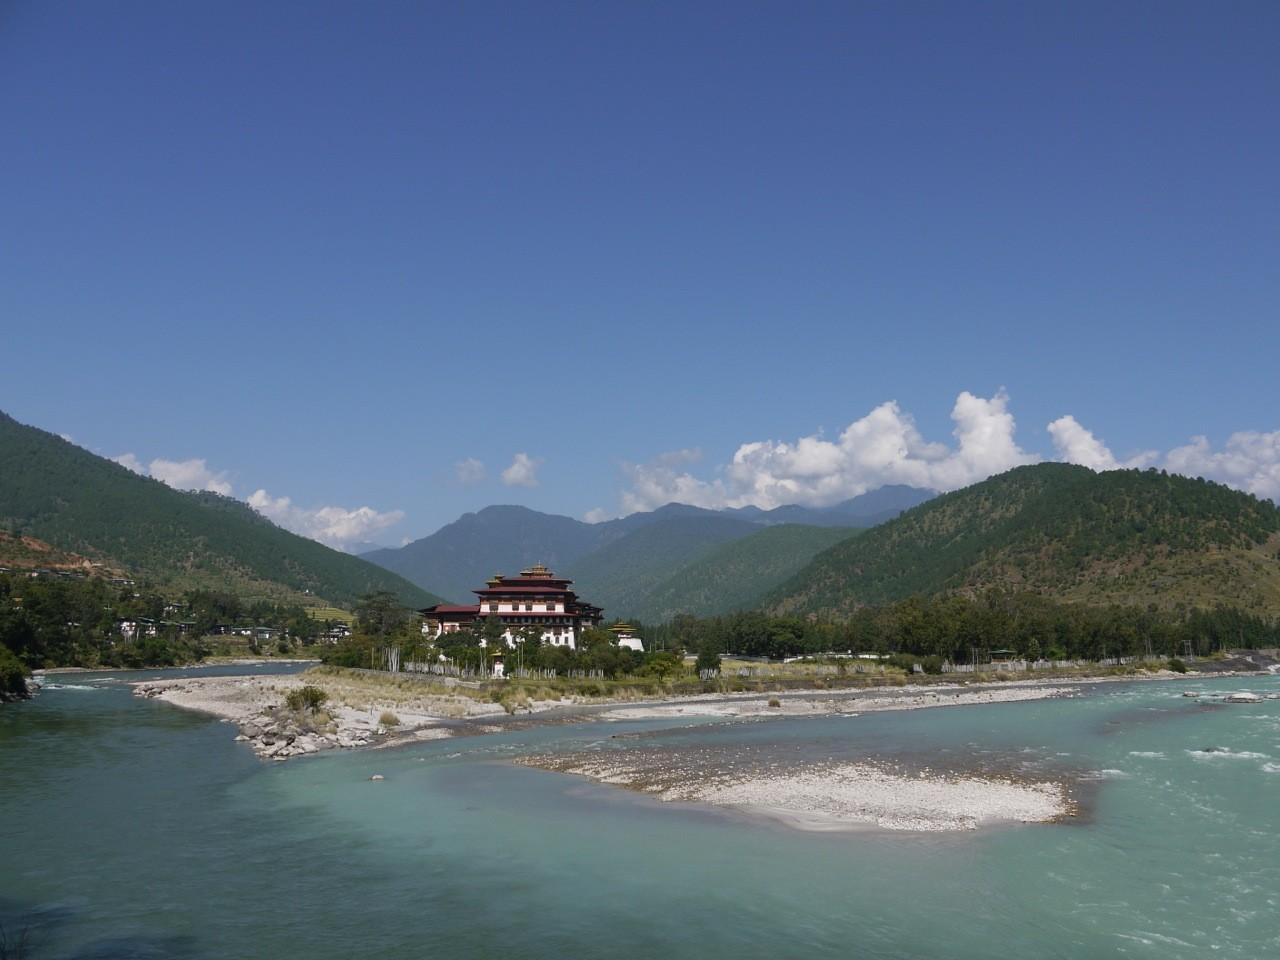 Bhutan Tour and Travel